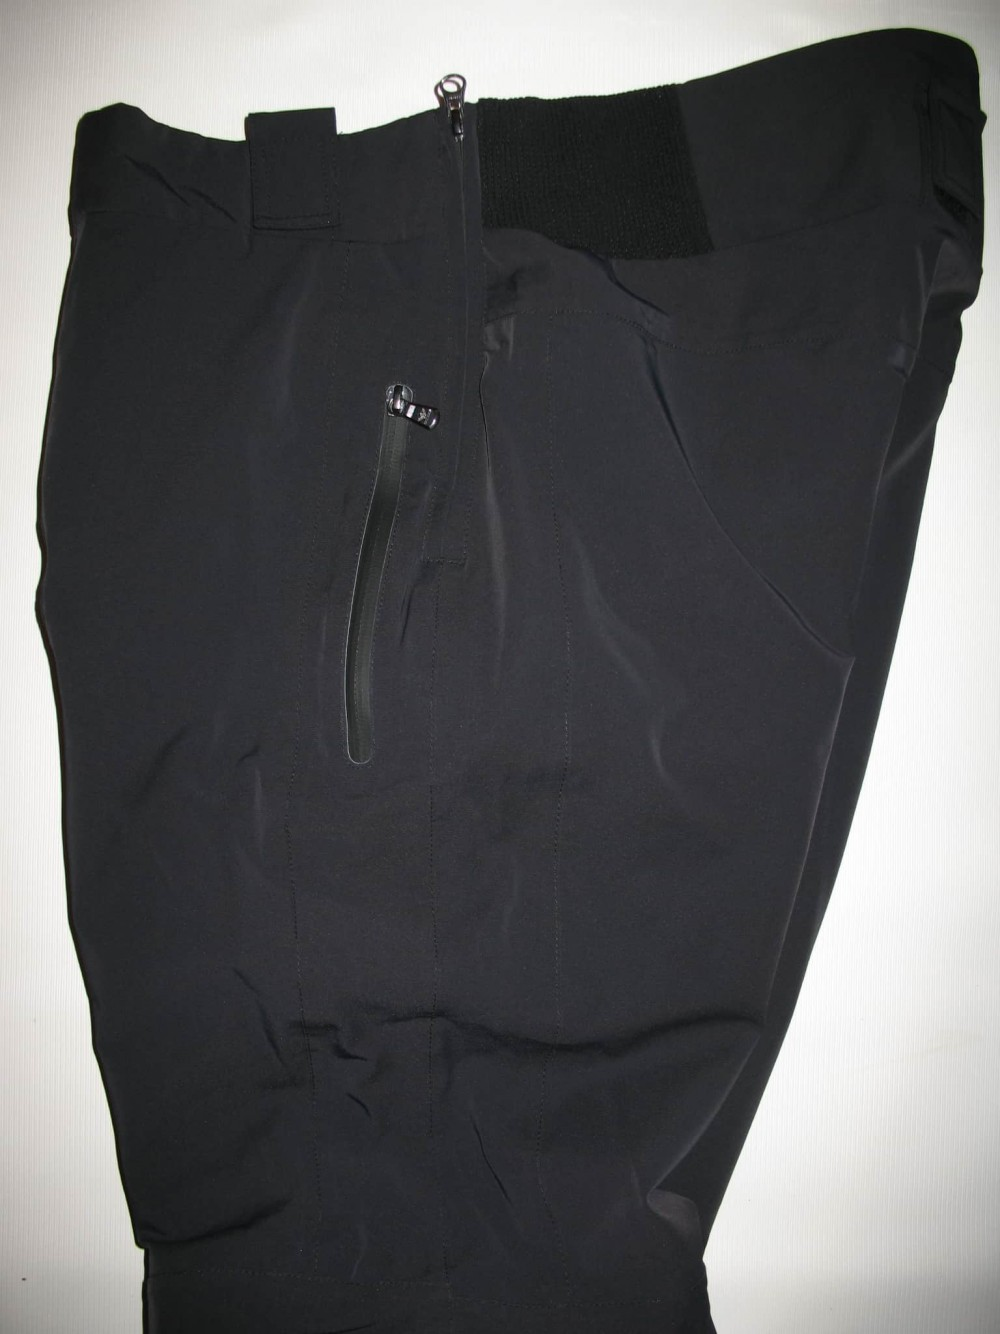 Штаны EA7 emporio armani ski bib pants ( размер XL) - 8